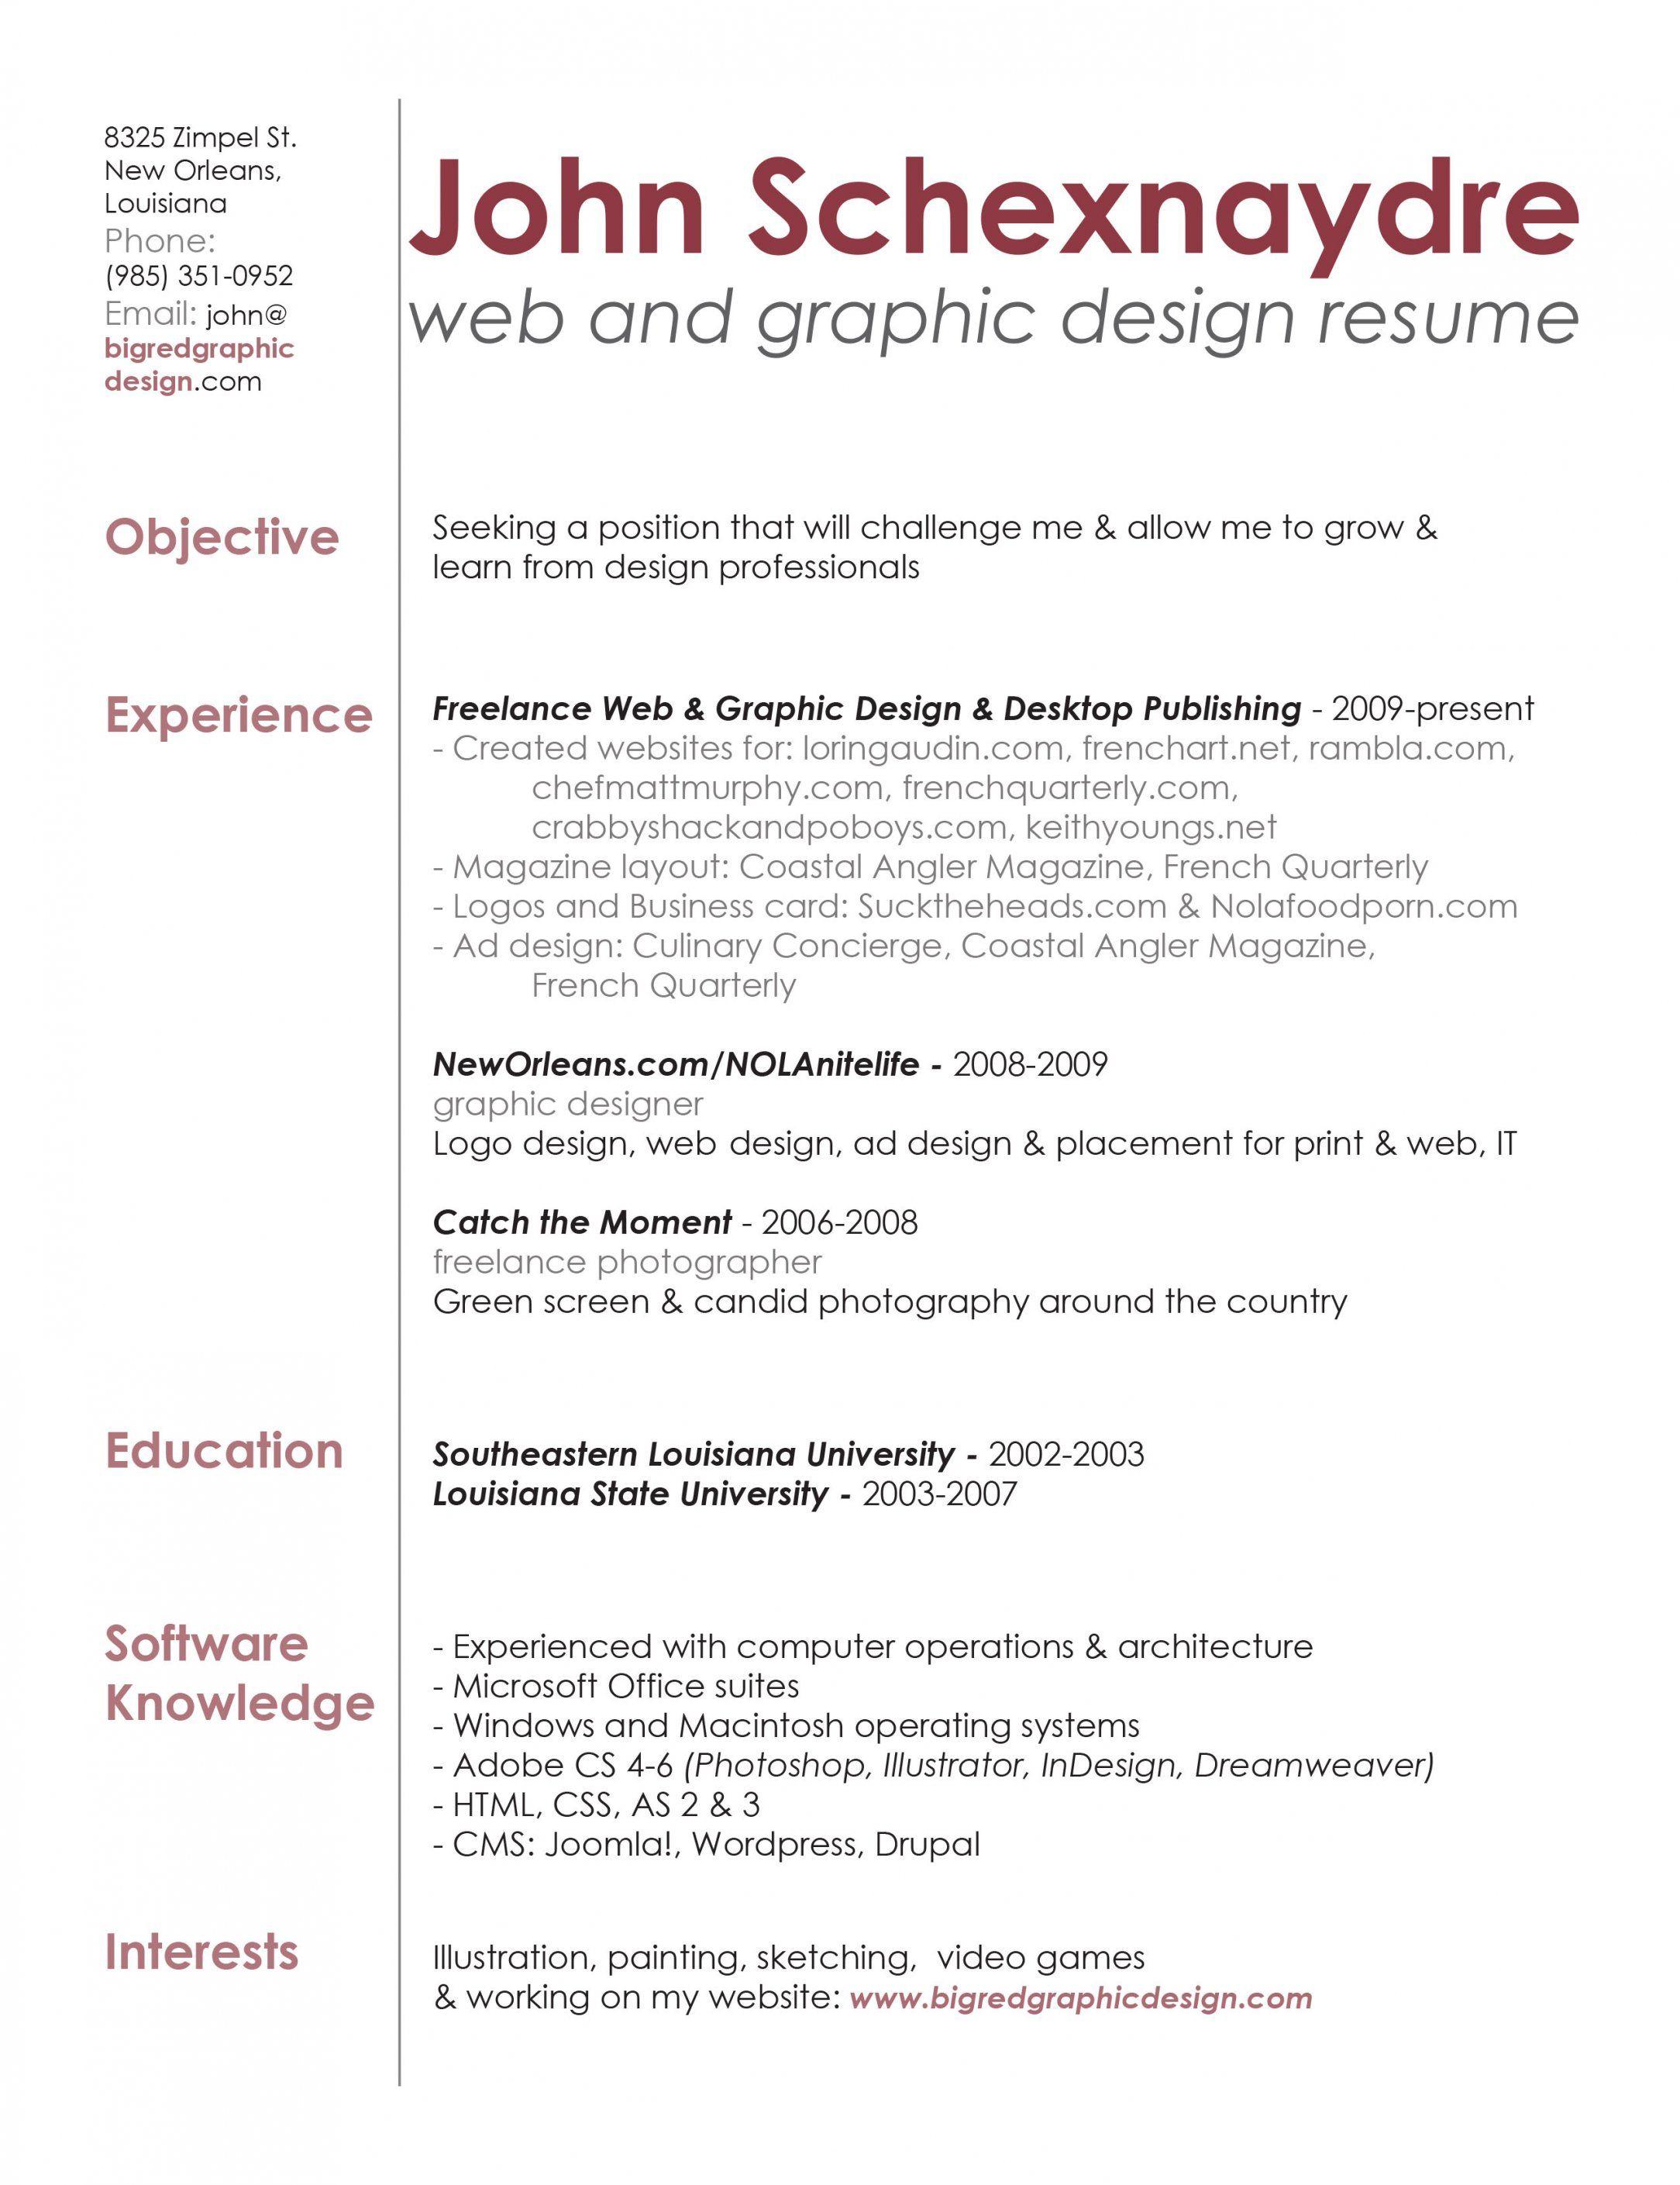 Contemporary Web Designing Resume For Fresher Vignette Graphic Design Resume Resume Design Graphic Resume